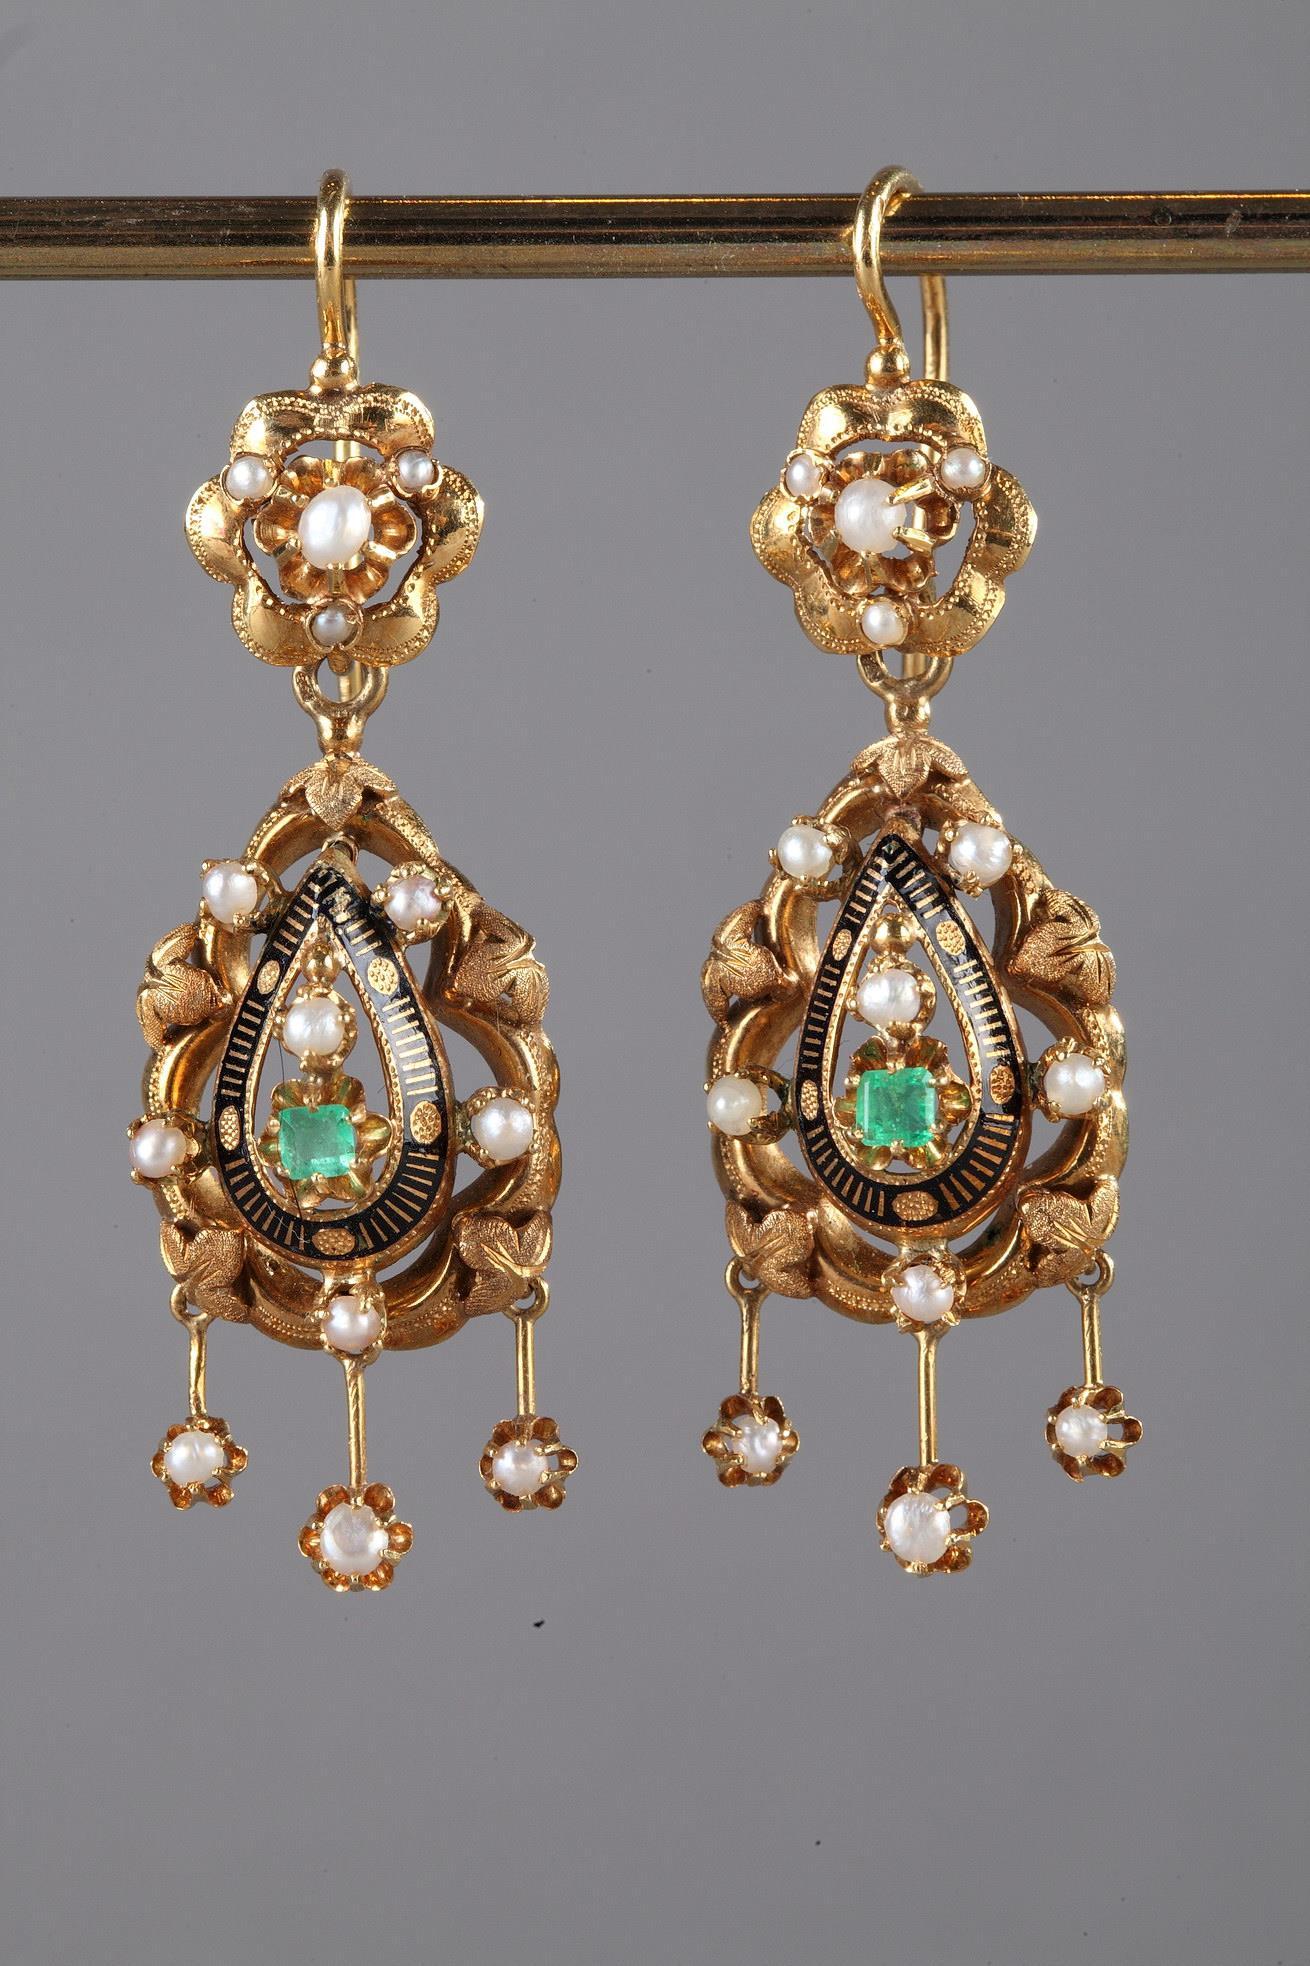 Pair of Gold, Enamel, Pearl, and Emerald Earrings